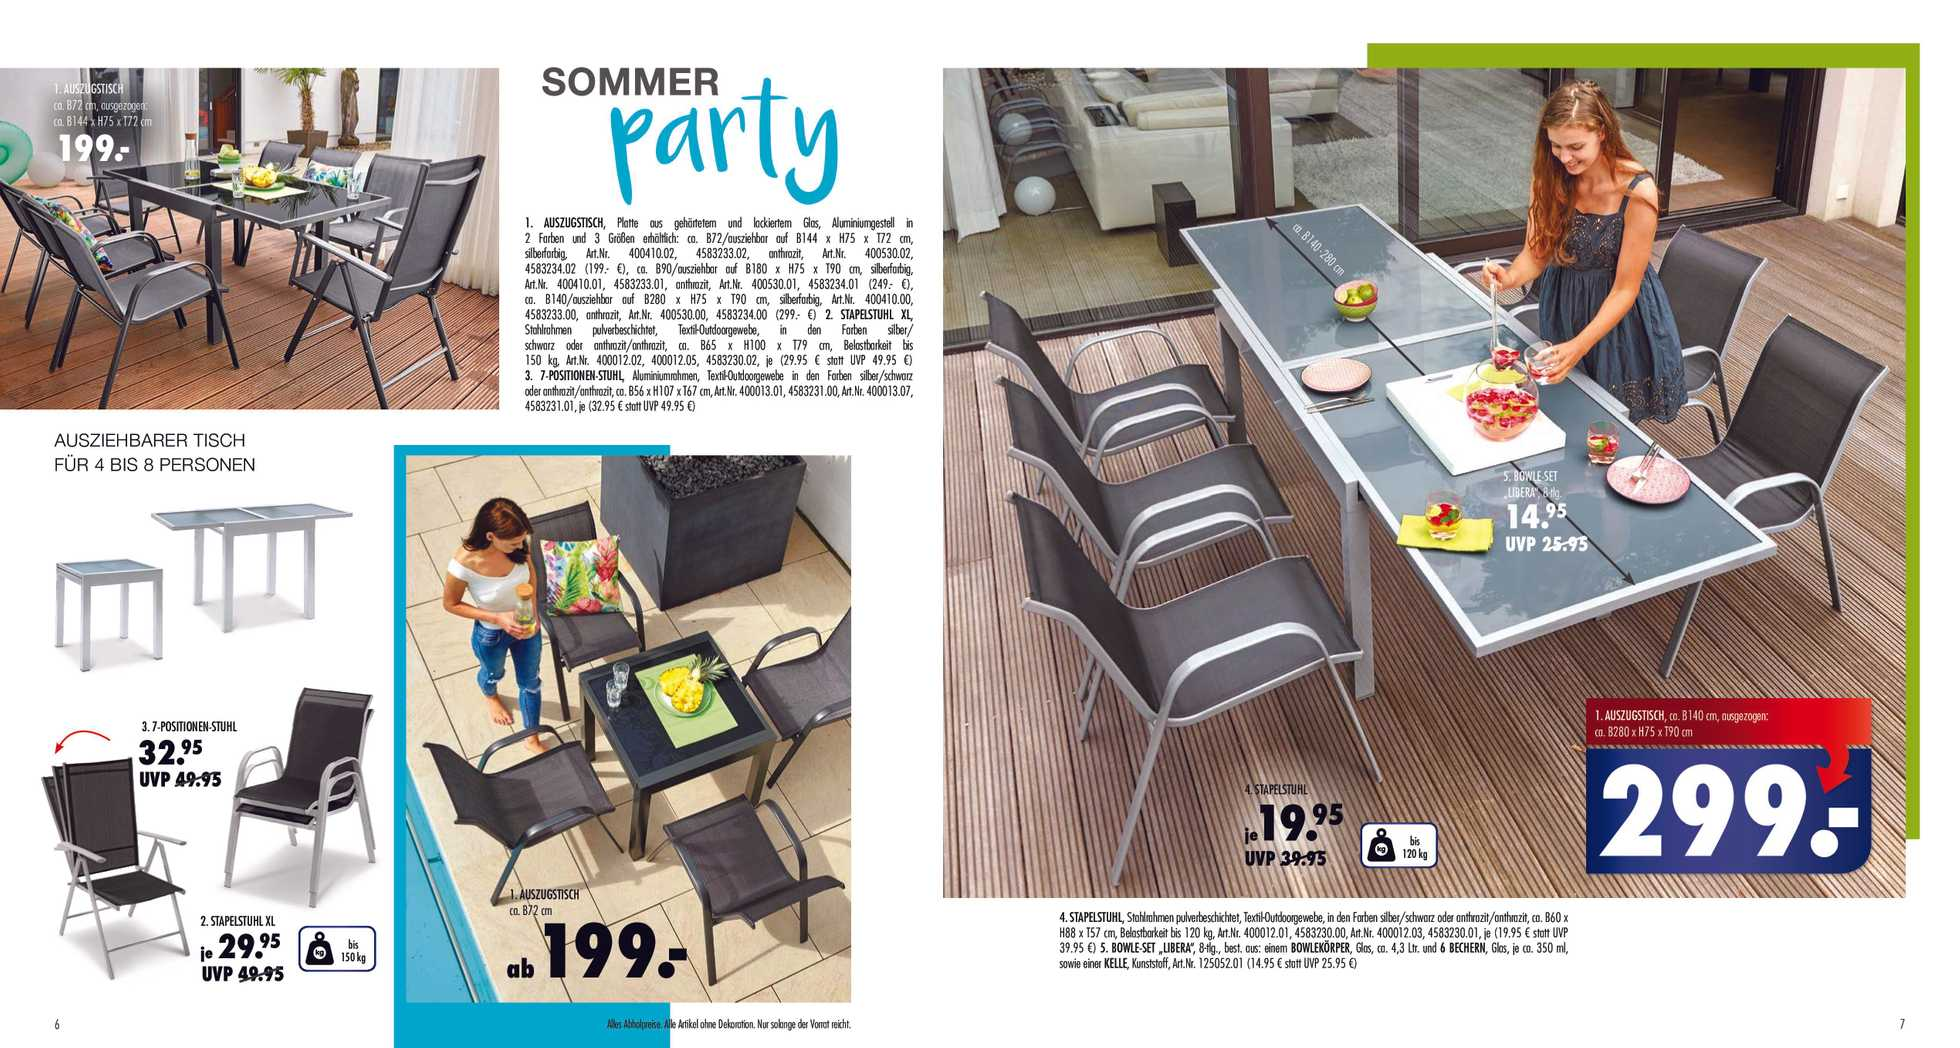 Möbel Hausmann Werbeflugblatt 080319 Depromotonscom